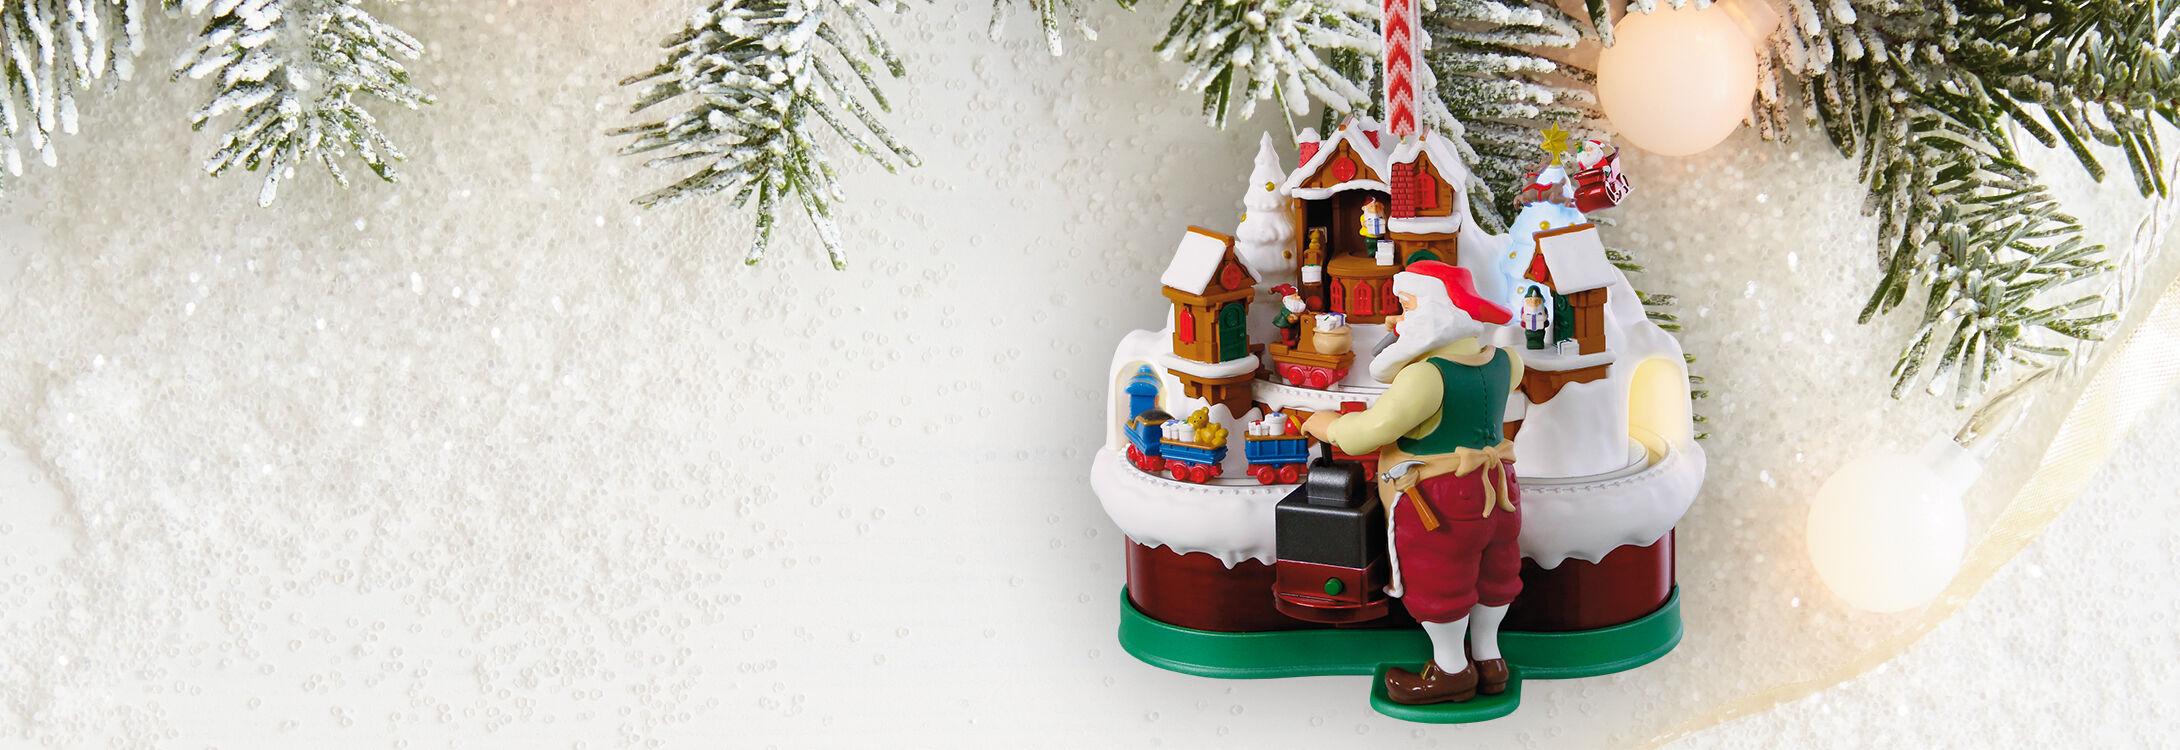 Ornaments | Christmas Tree Decorations | Hallmark